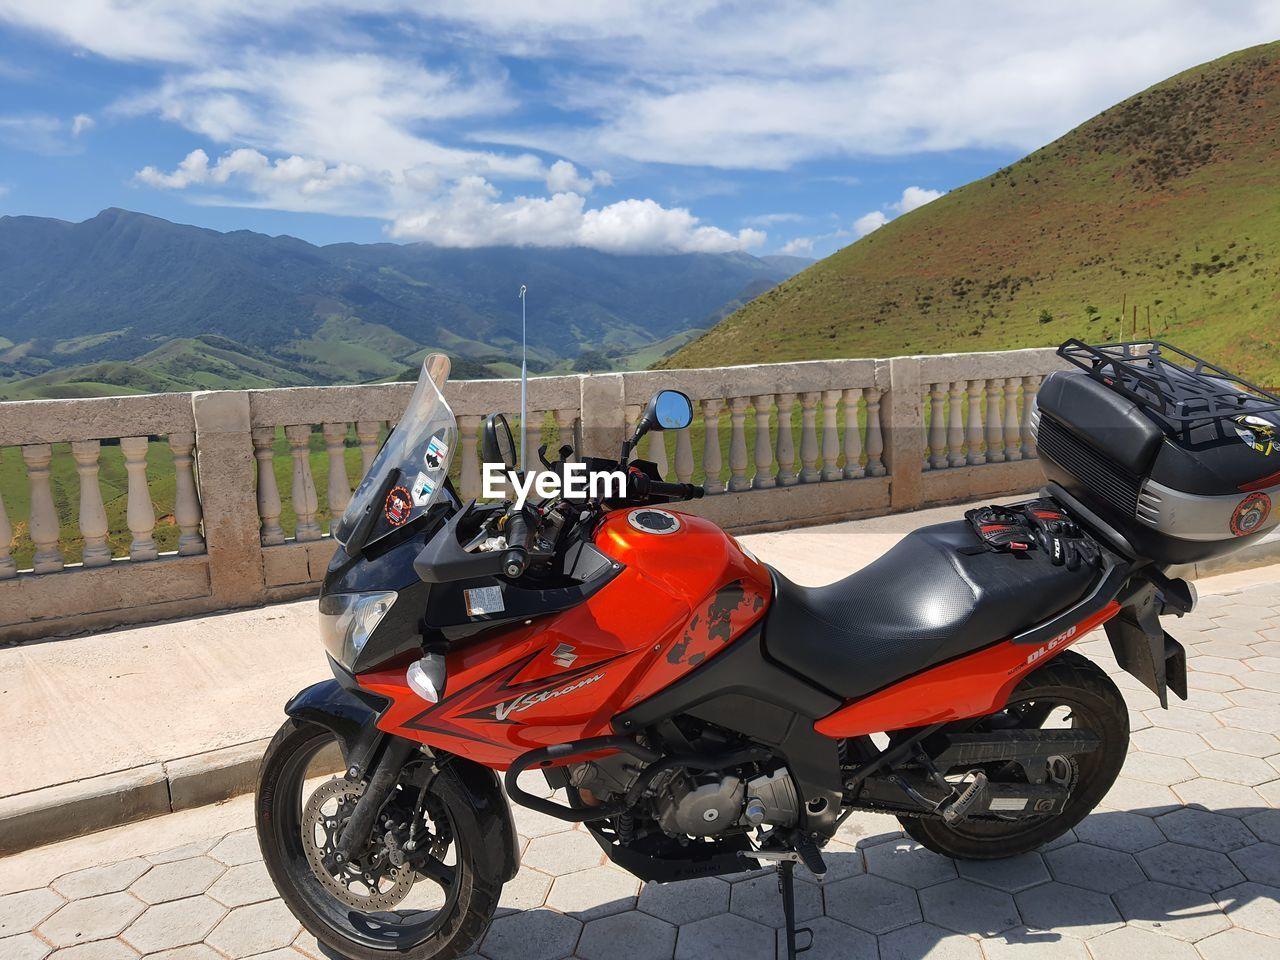 MOTOR SCOOTER AGAINST MOUNTAIN RANGE